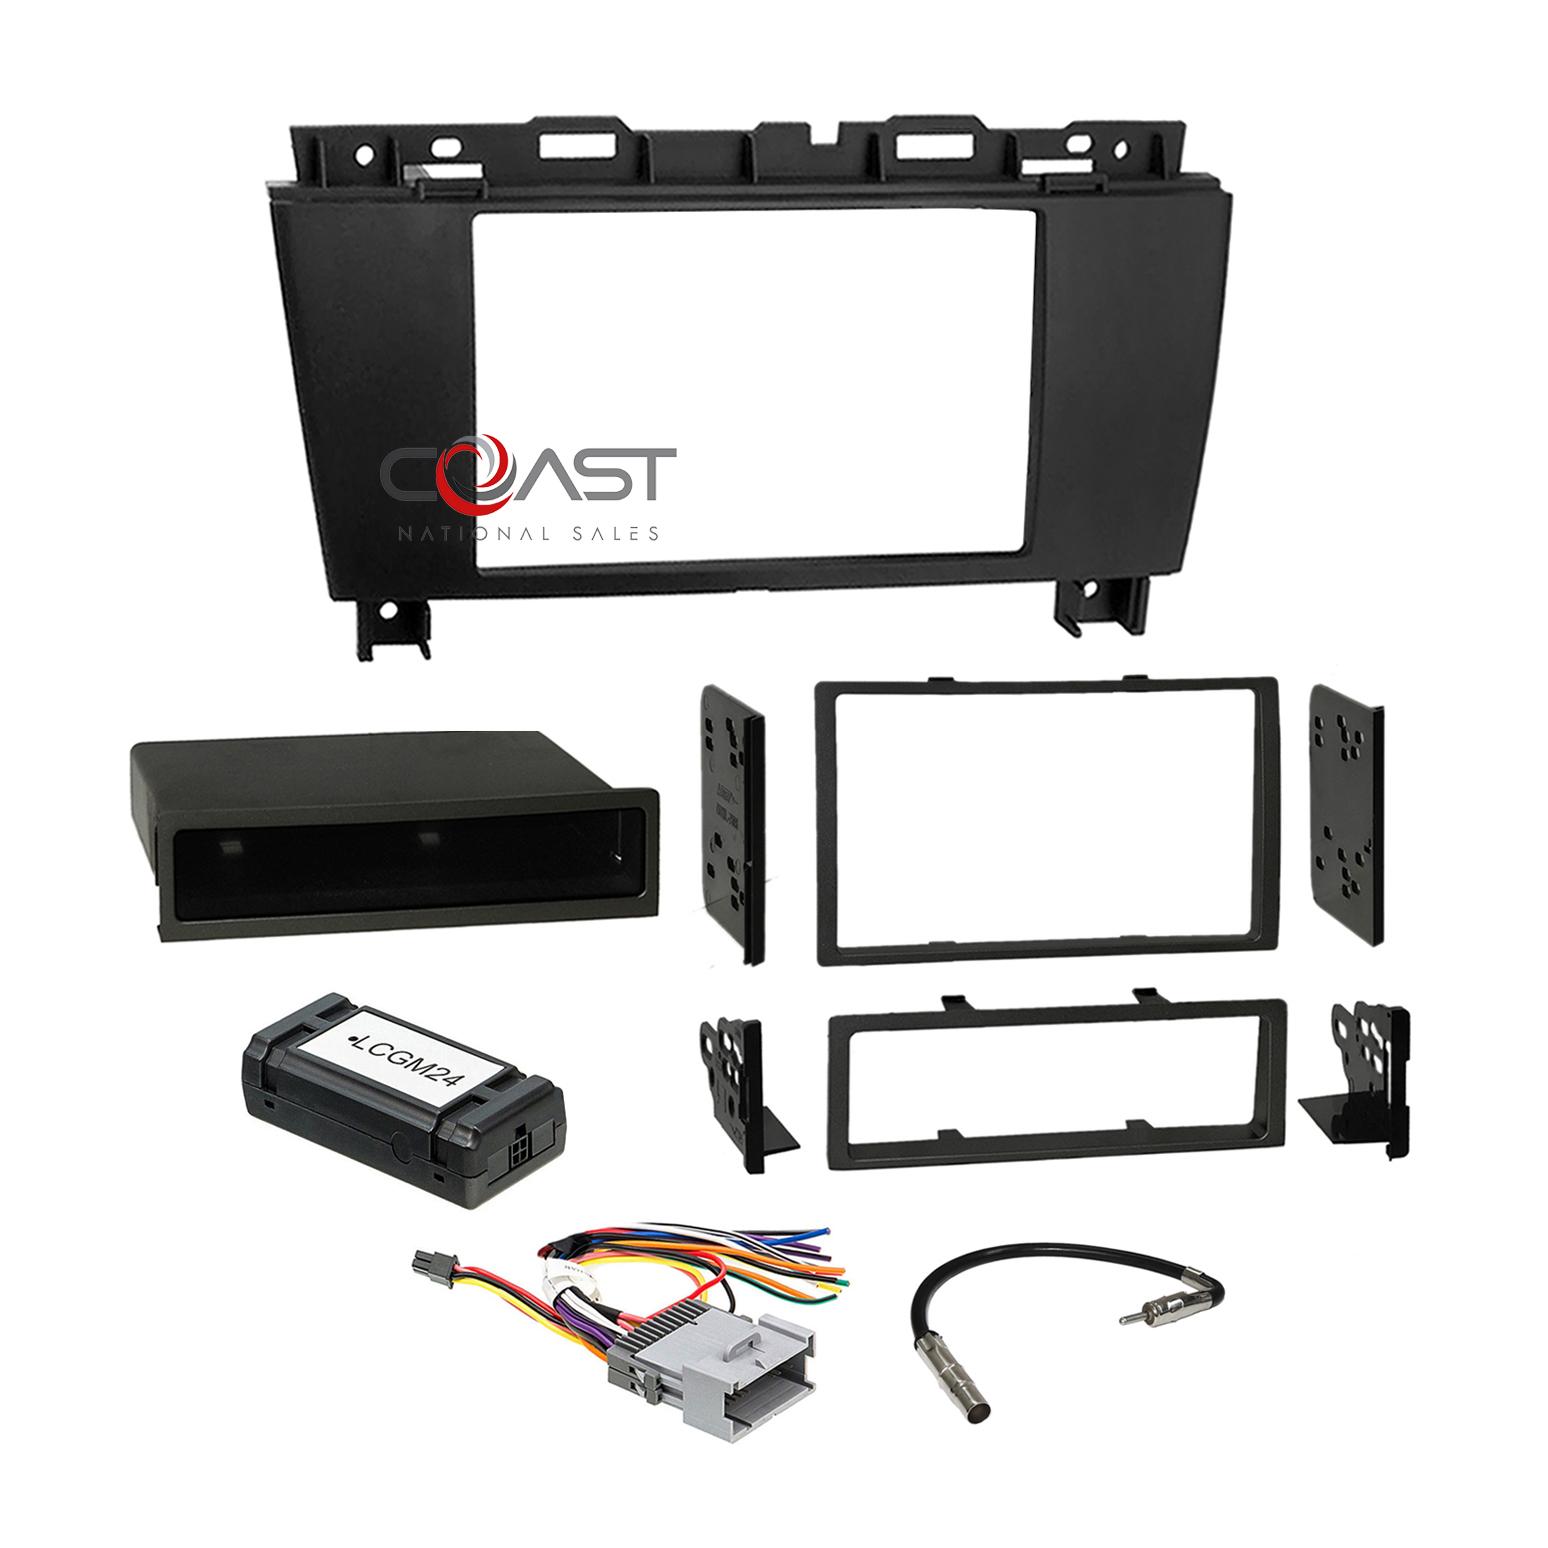 Car Radio Stereo Dash Kit Standard Bose Wire Harness for 2005-09 ... 2001 buick lesabre radio wiring diagram eBay